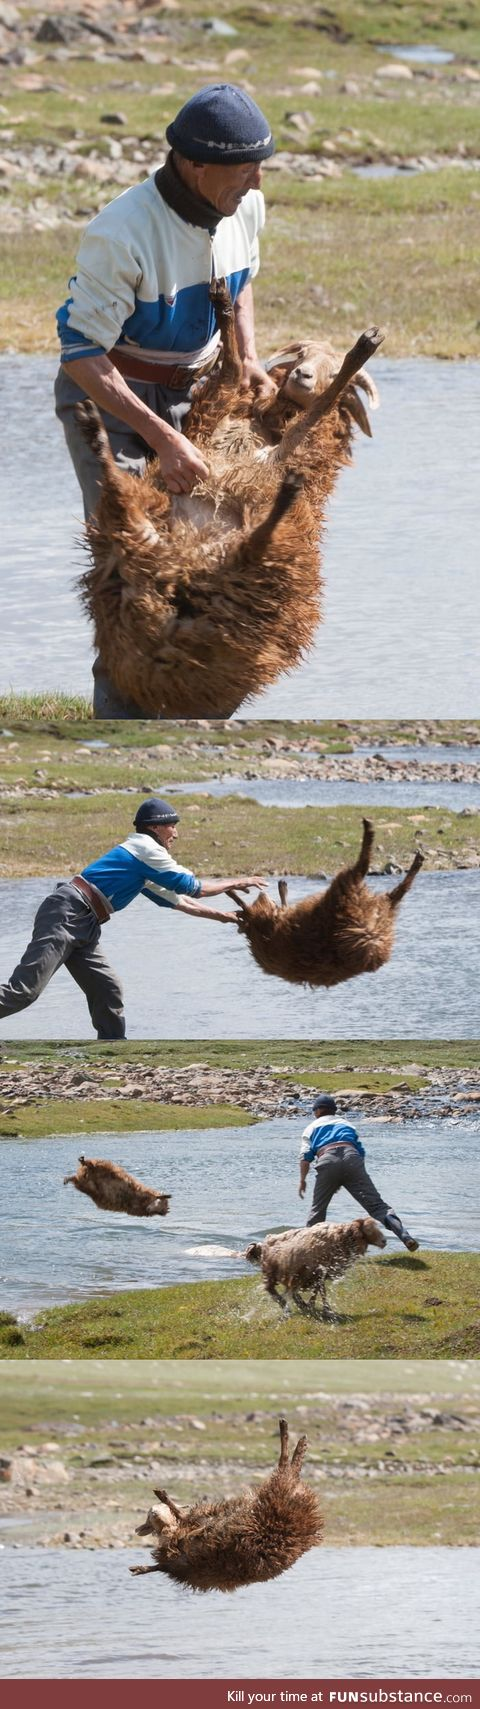 How the Mongolian bathe the sheep